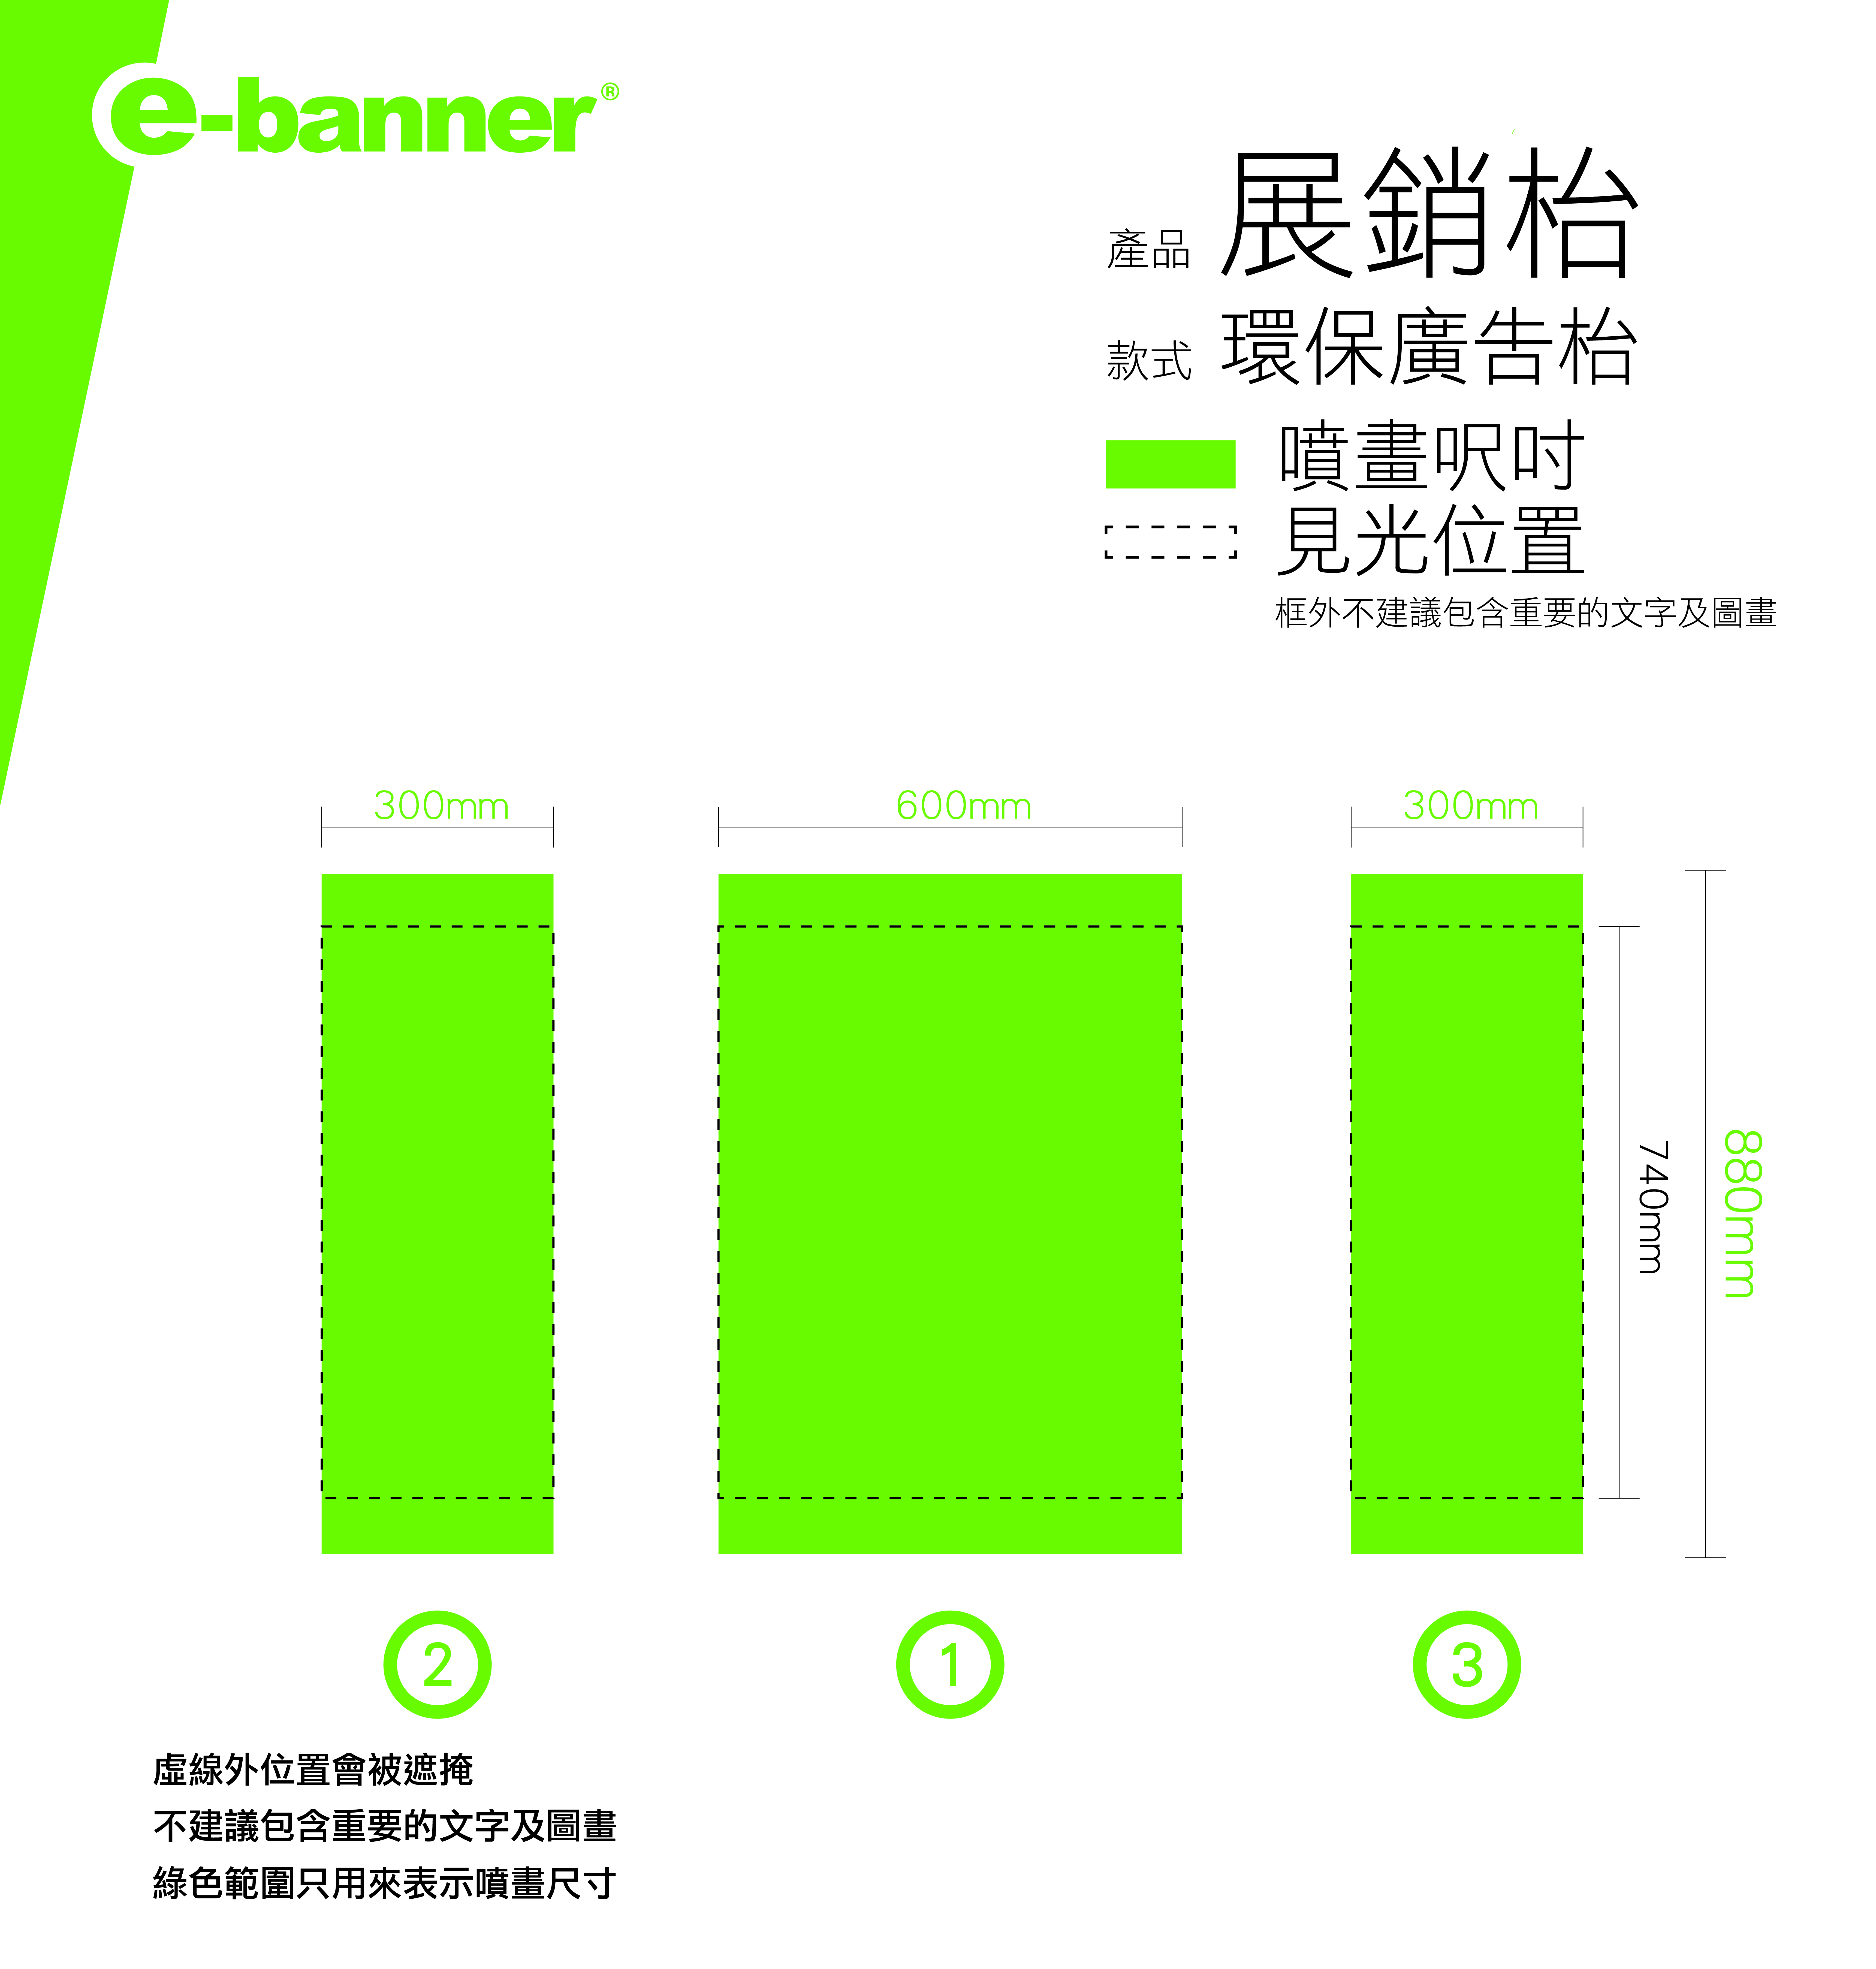 e-banner 環保廣告枱